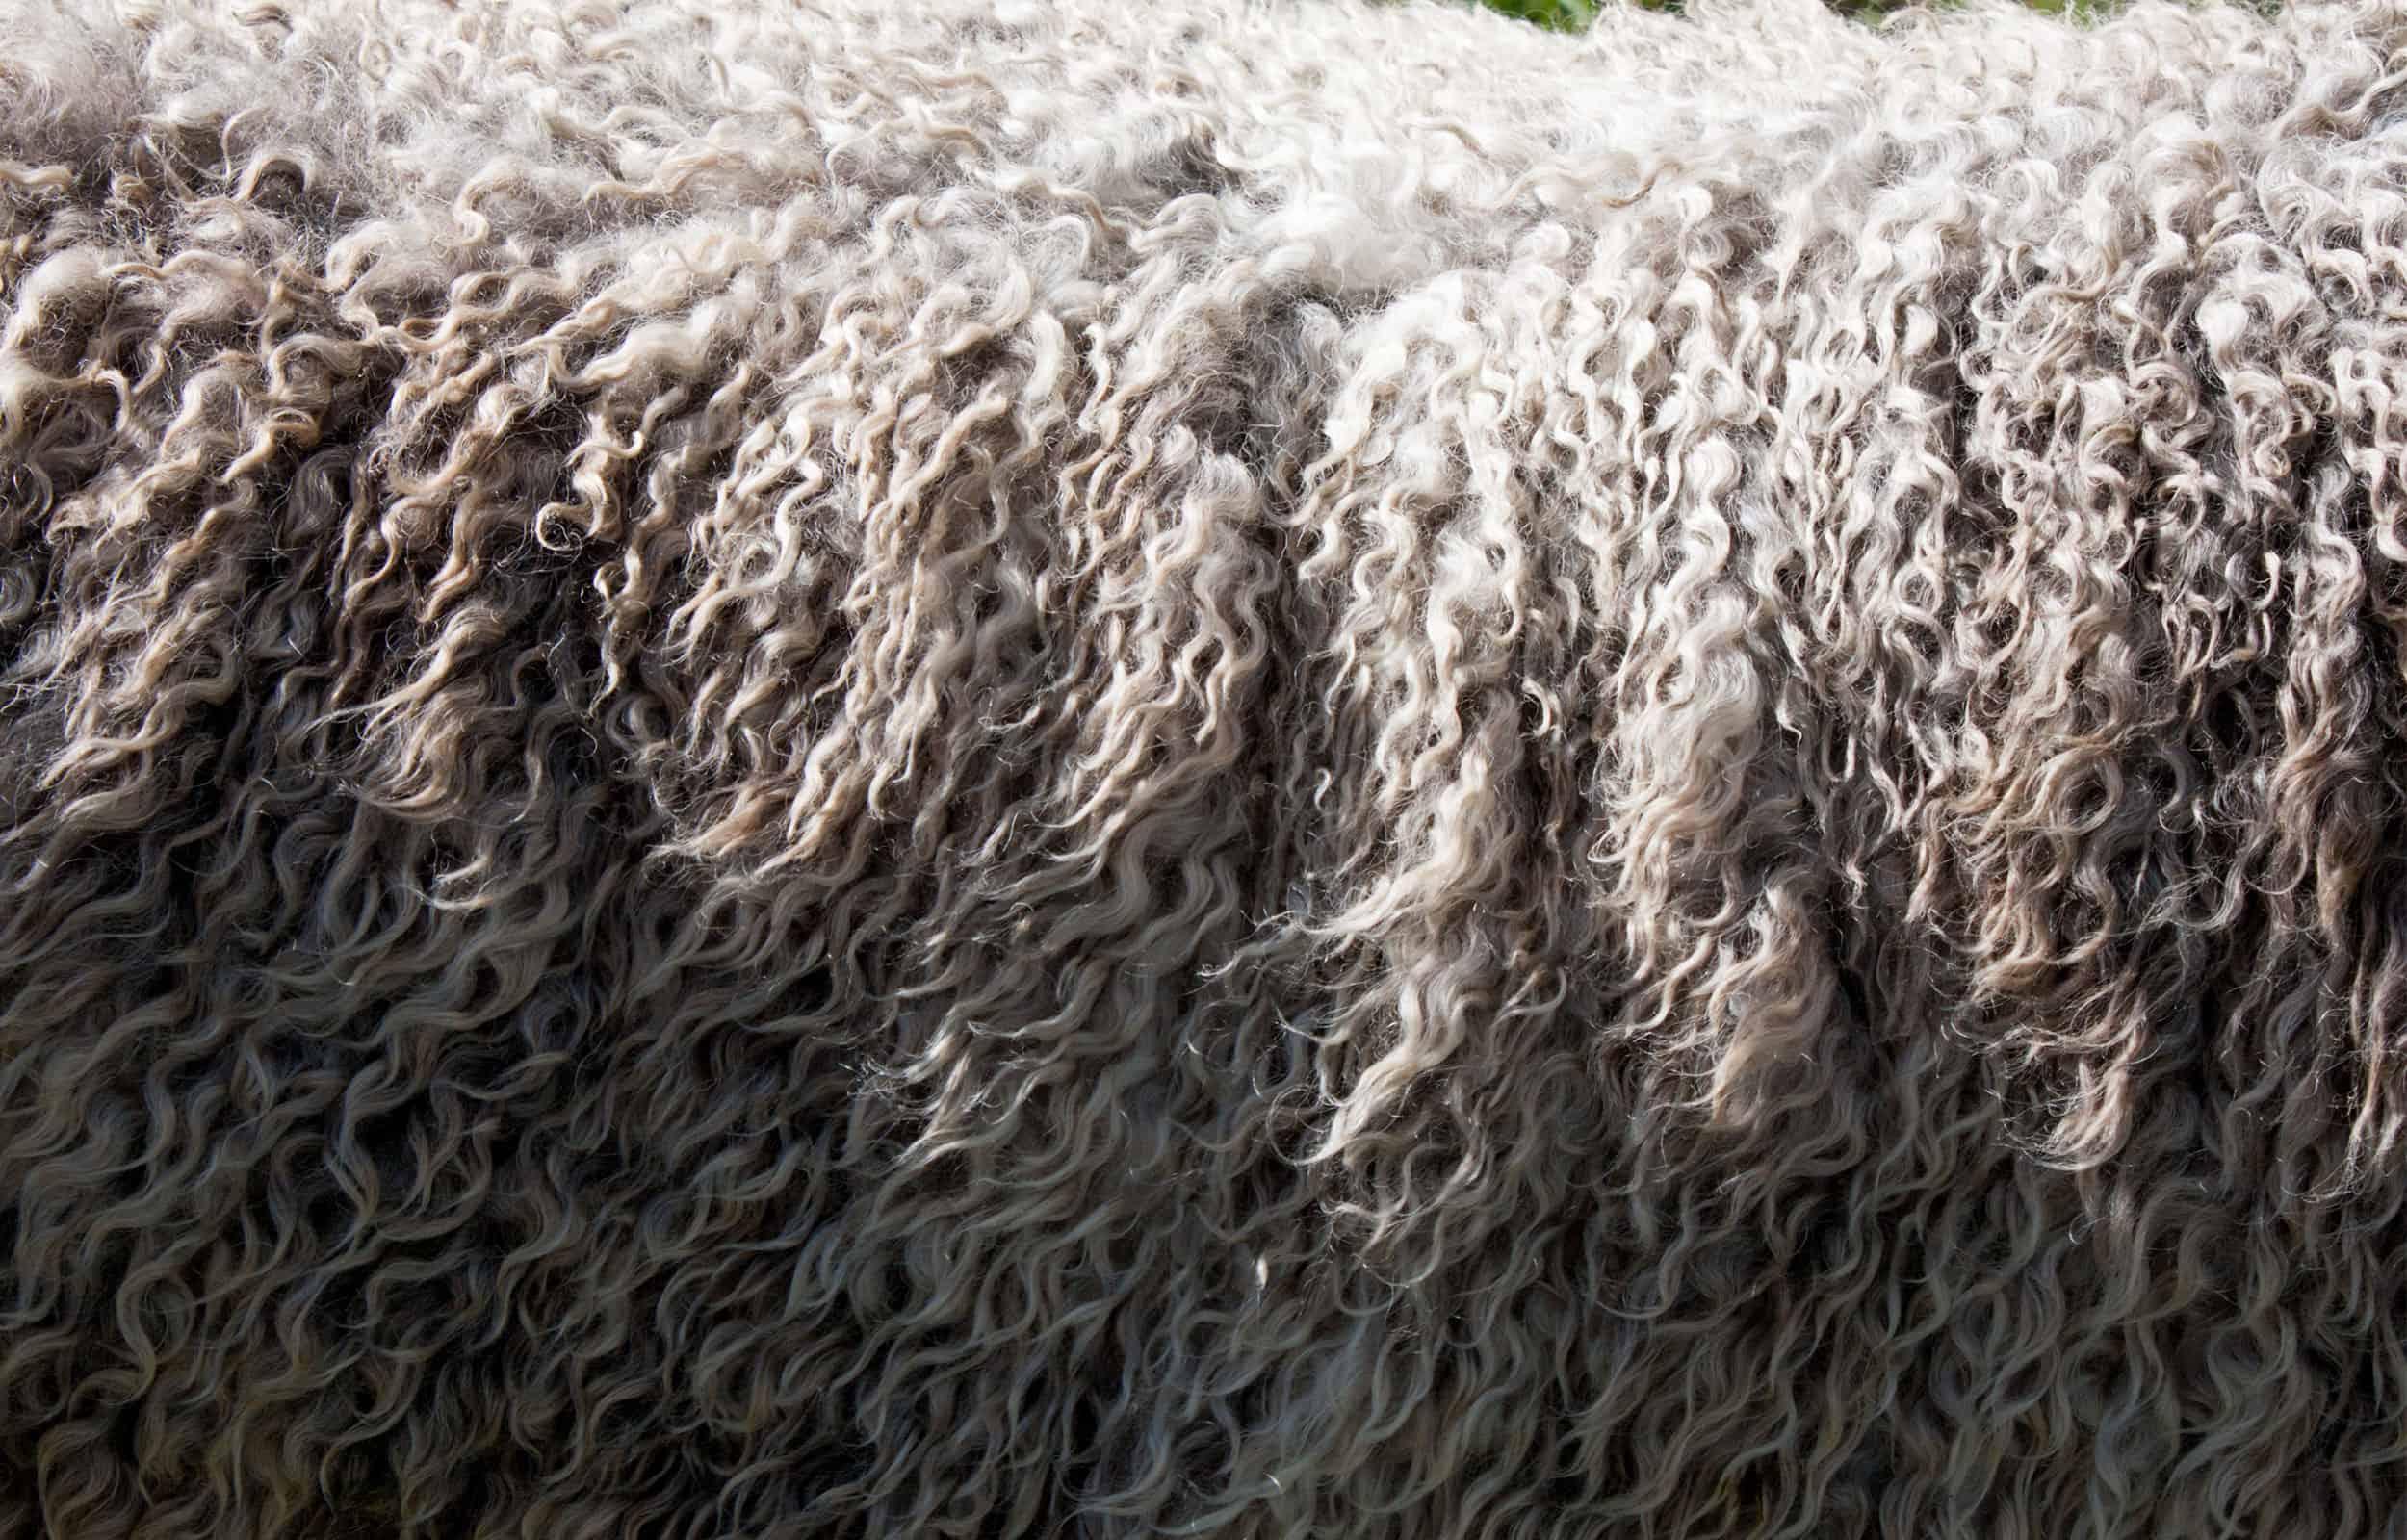 close up of the sheep fur